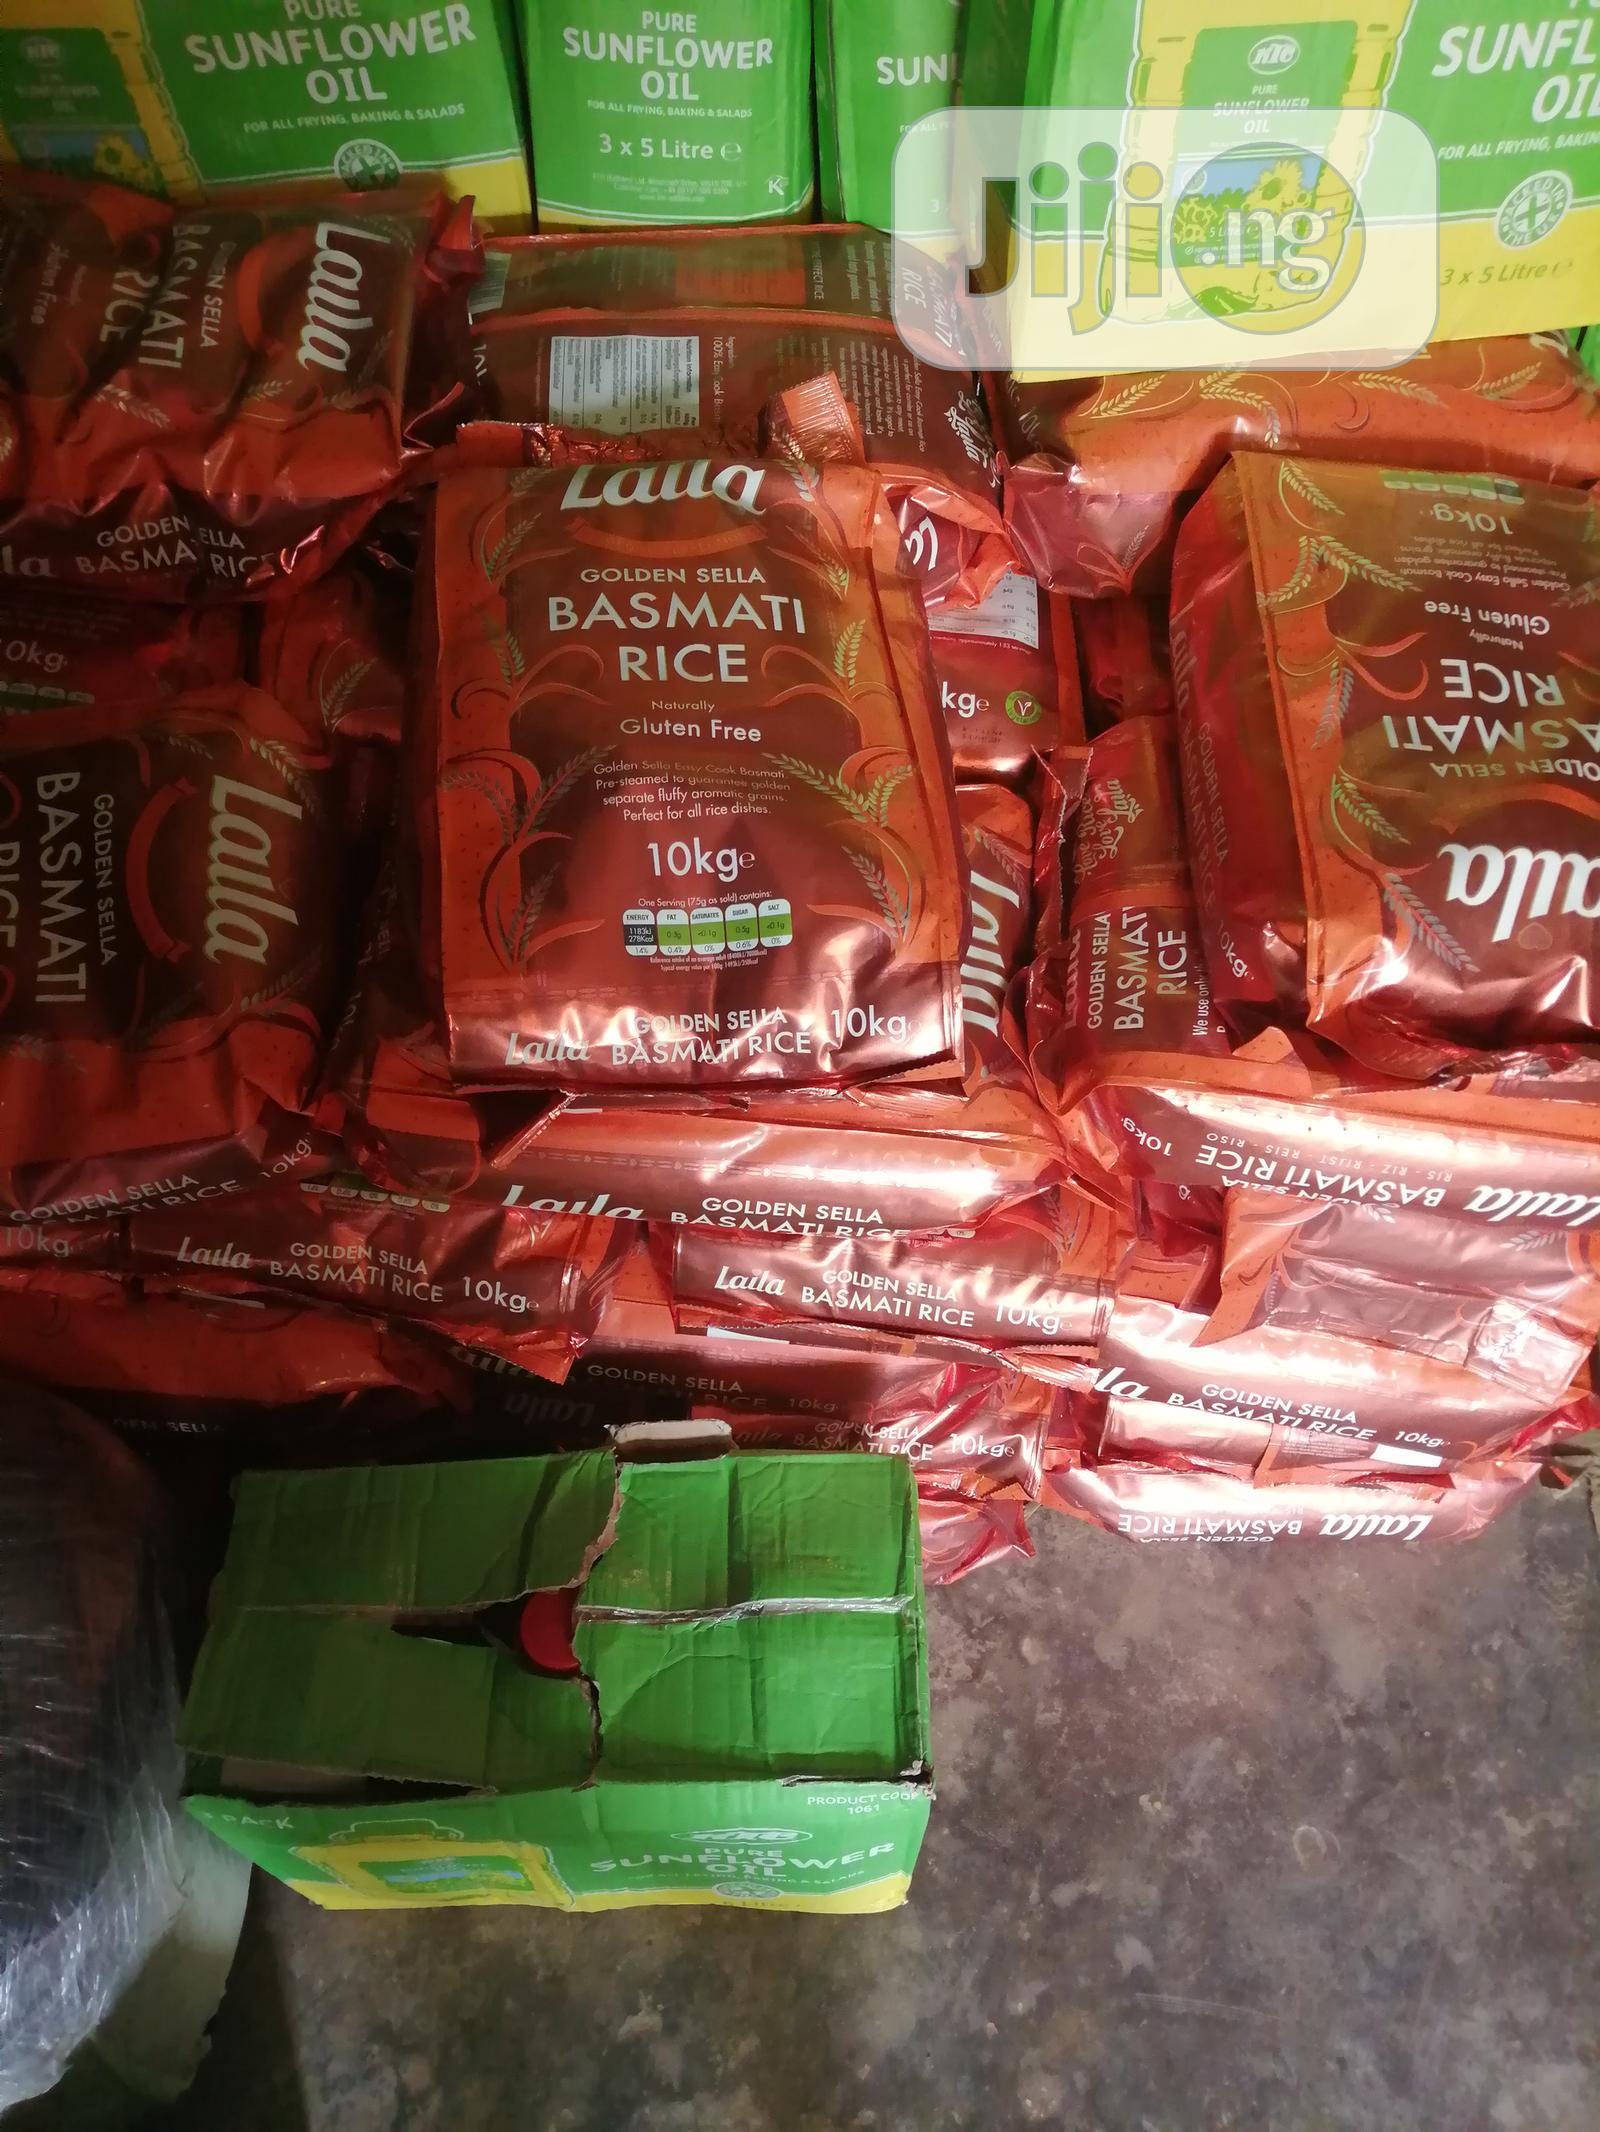 Archive: Laila Golden Sella Basmati Rice 10kg